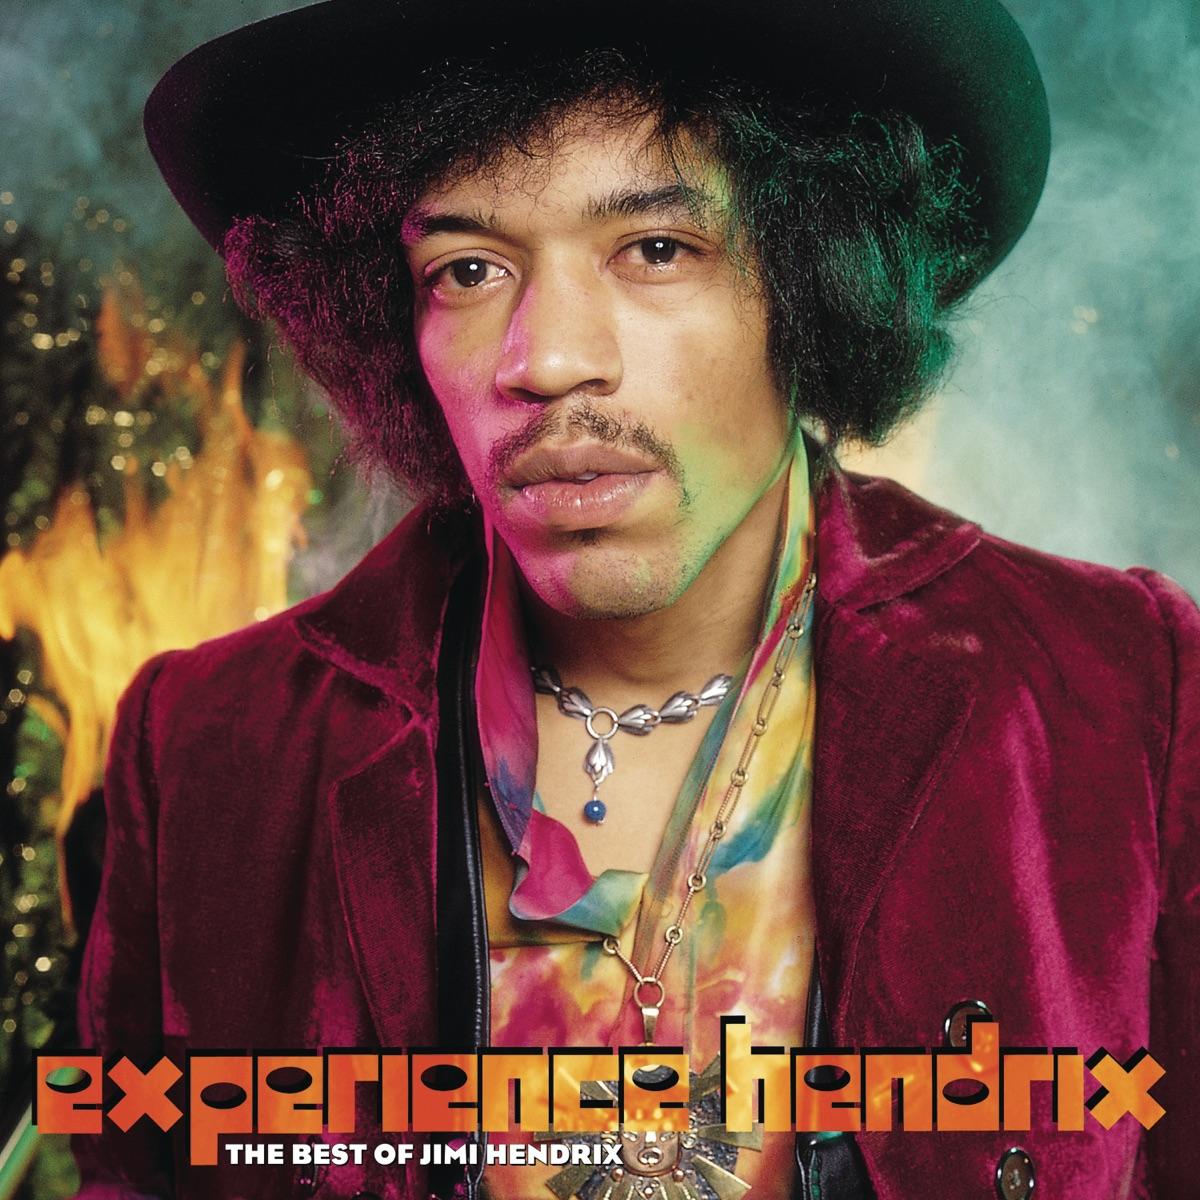 Experience Hendrix The Best of Jimi Hendrix Jimi Hendrix CD cover